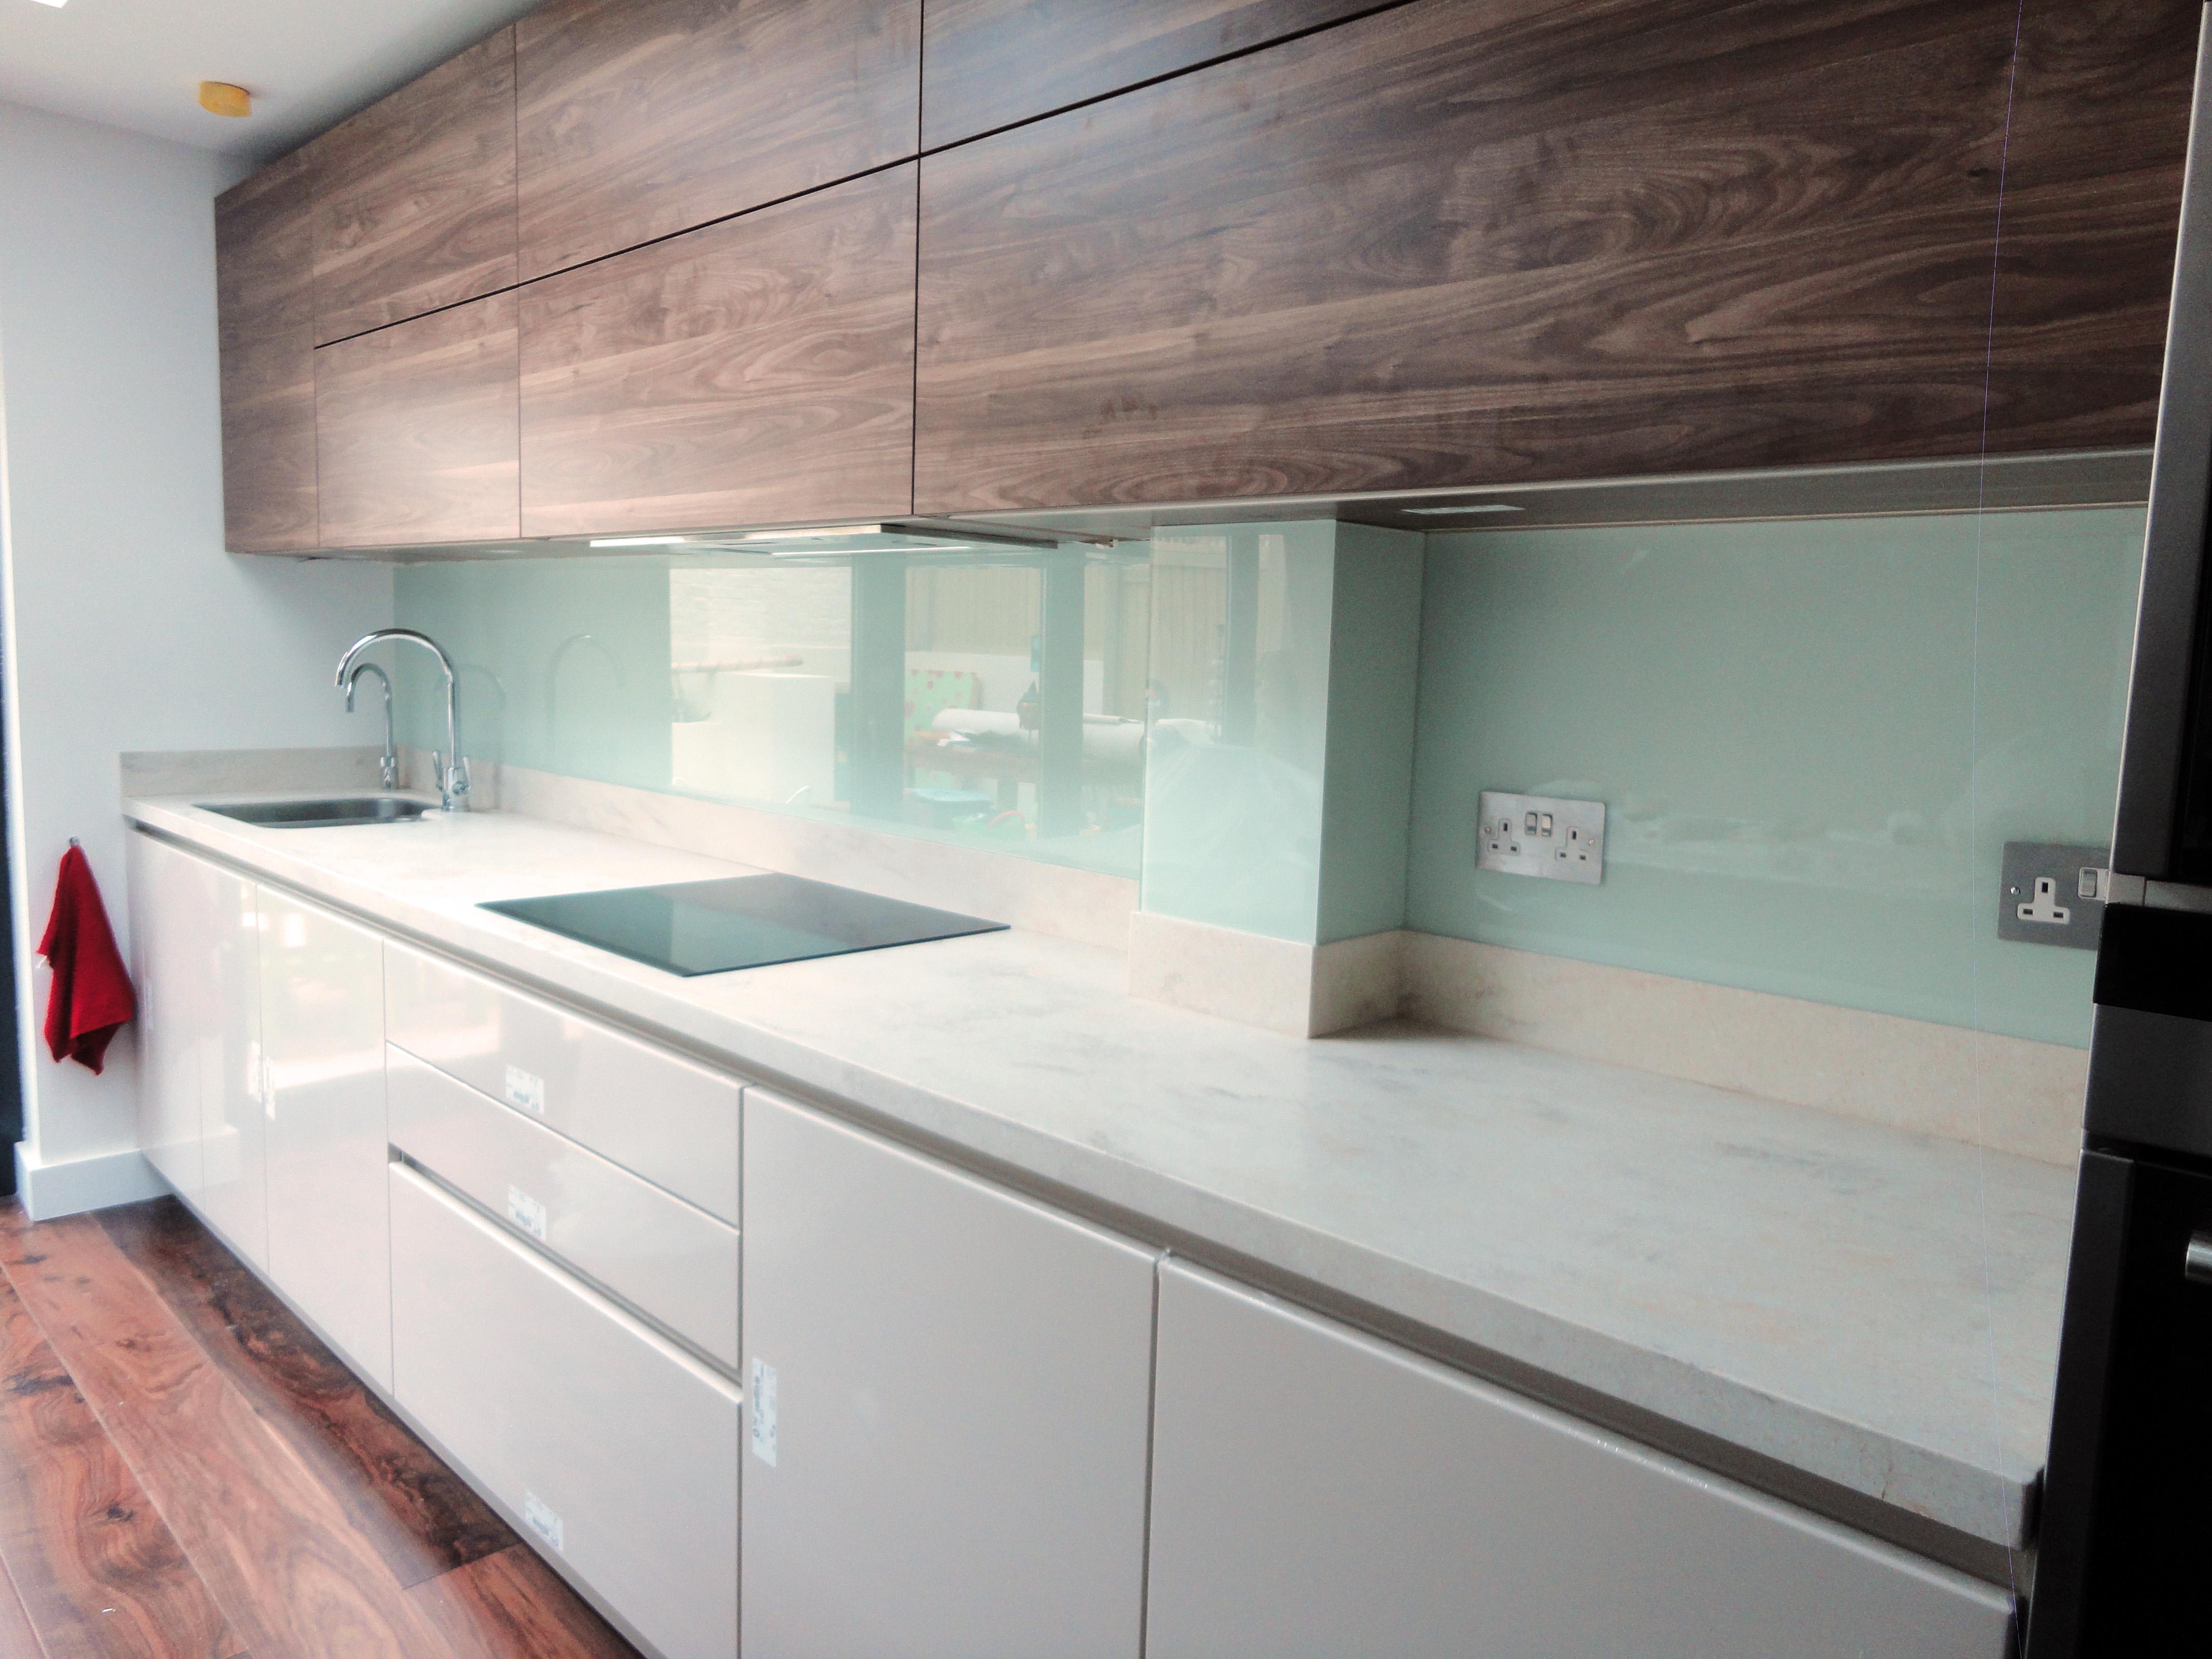 light-turquoise-kitchen-splashback-2.jpg (4320×3240)